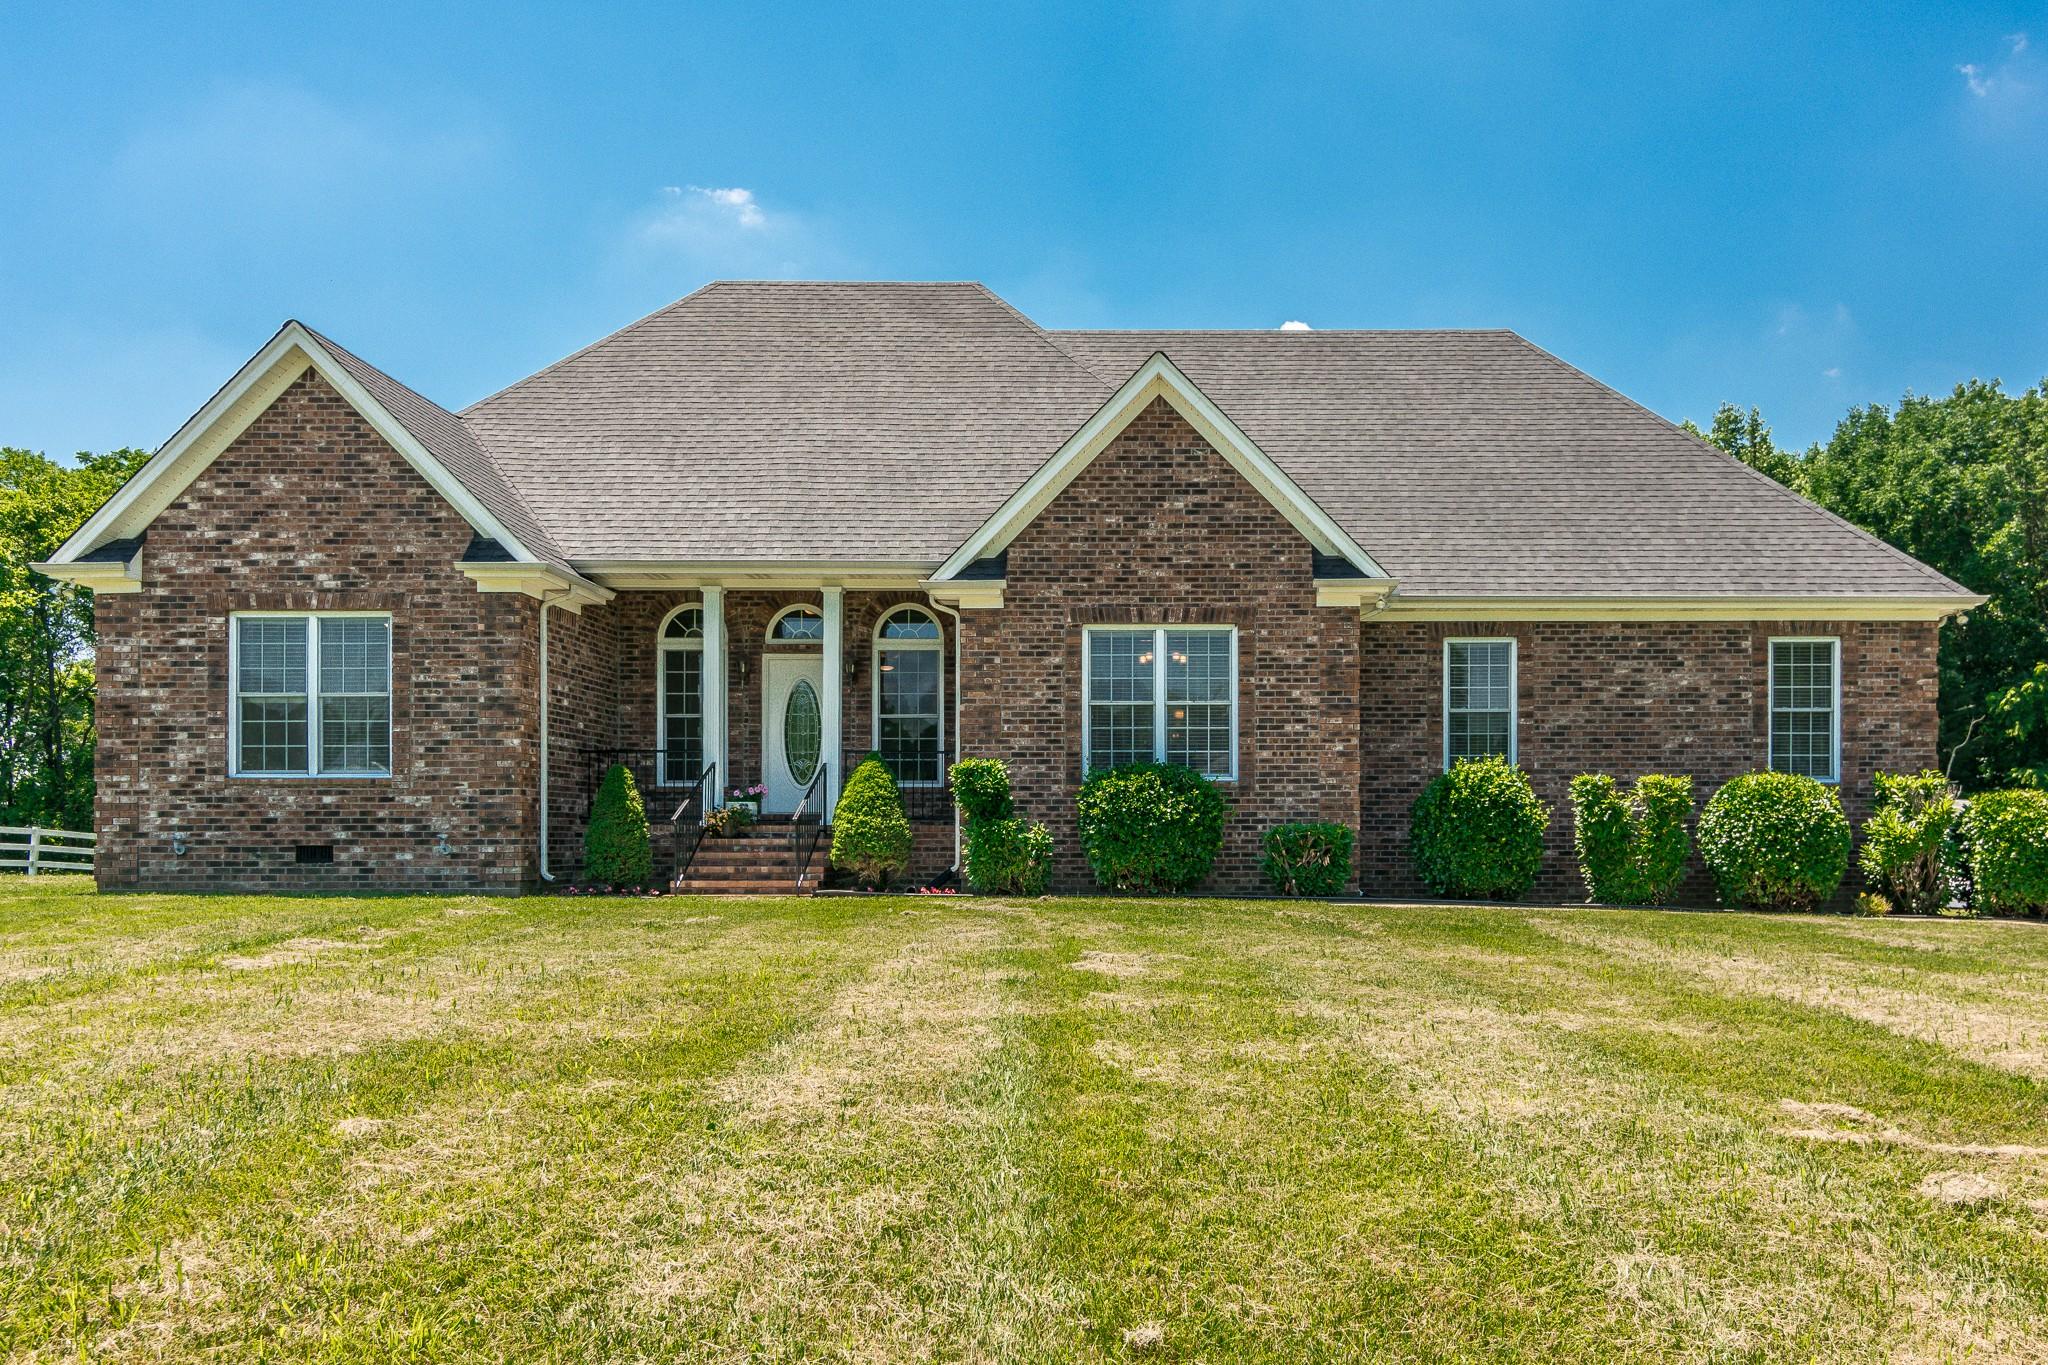 8069 Highway 25, E Property Photo - Cross Plains, TN real estate listing